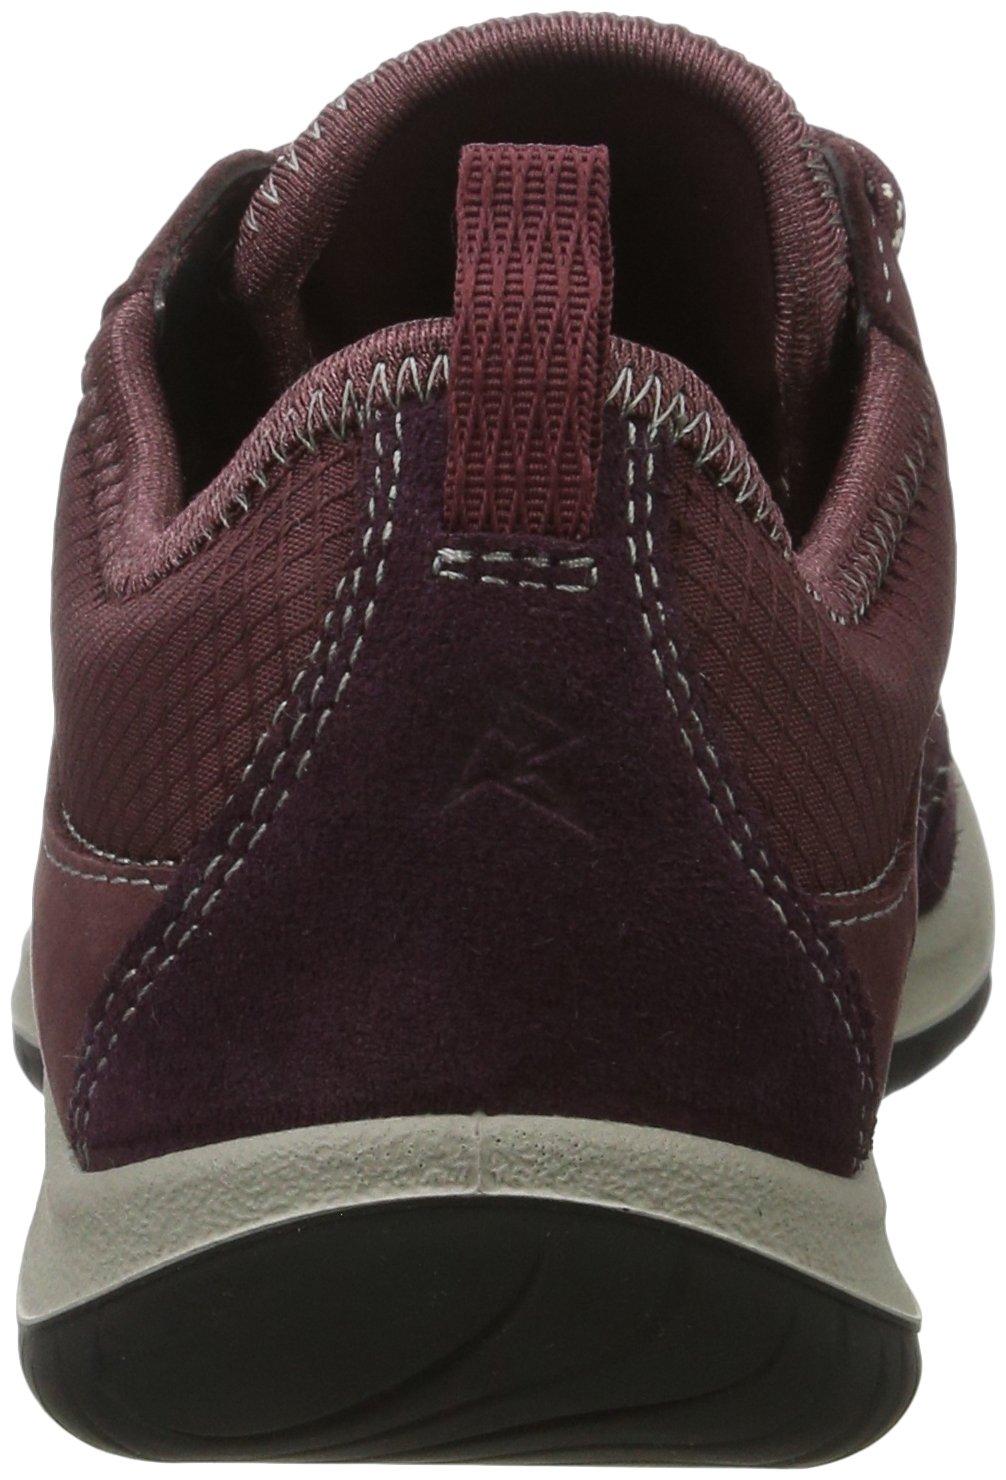 71VVXdhRGNL - ECCO Women's Aspina Multisport Outdoor Shoes